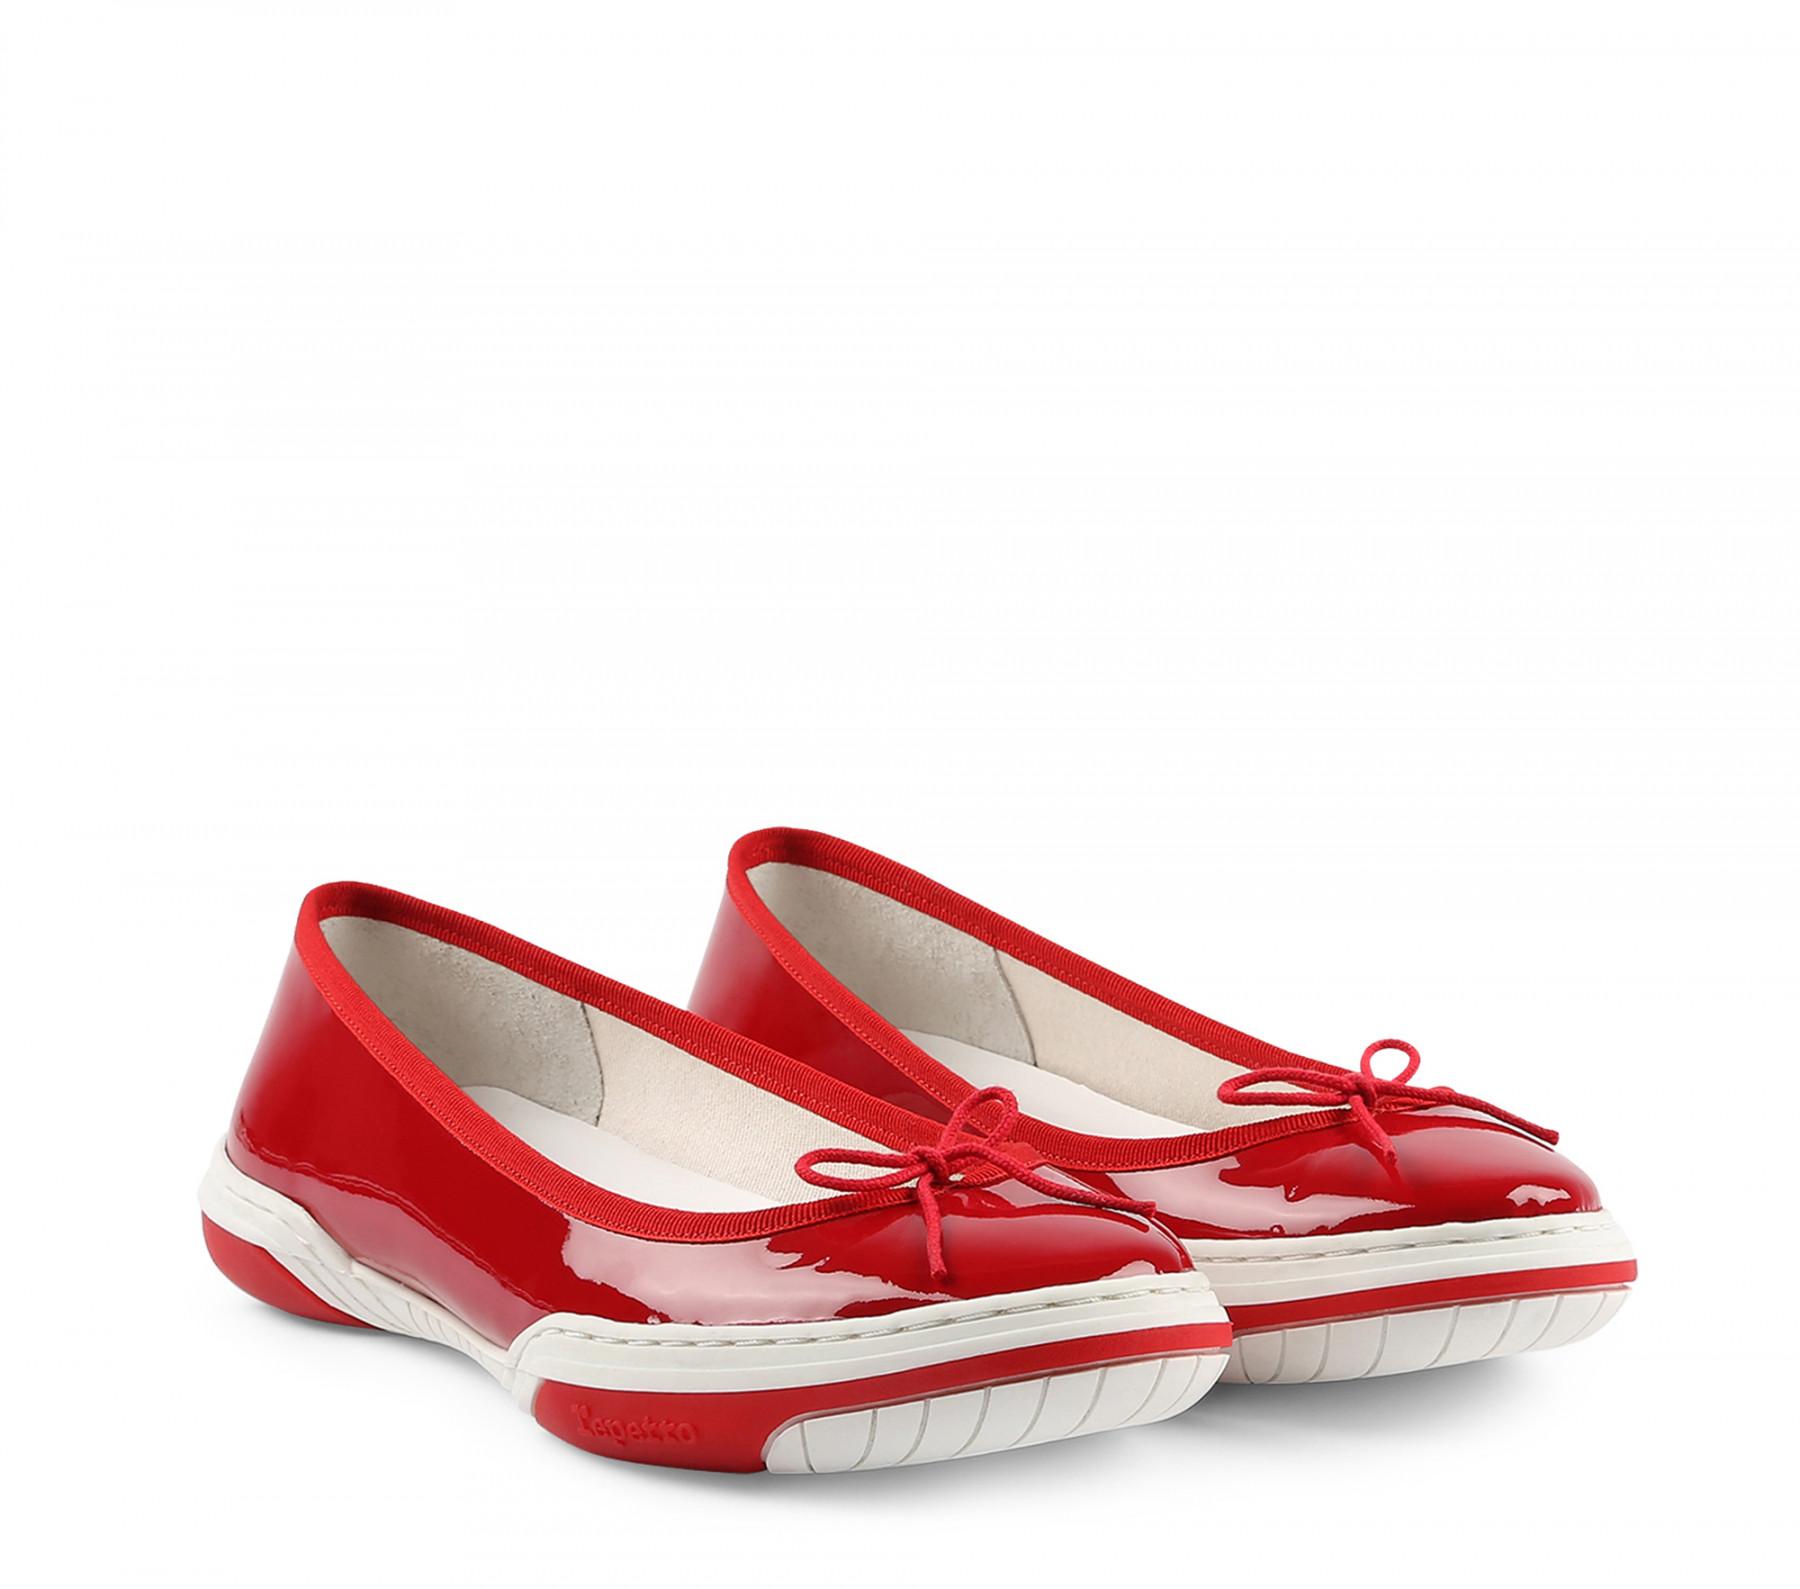 Aude sneakers